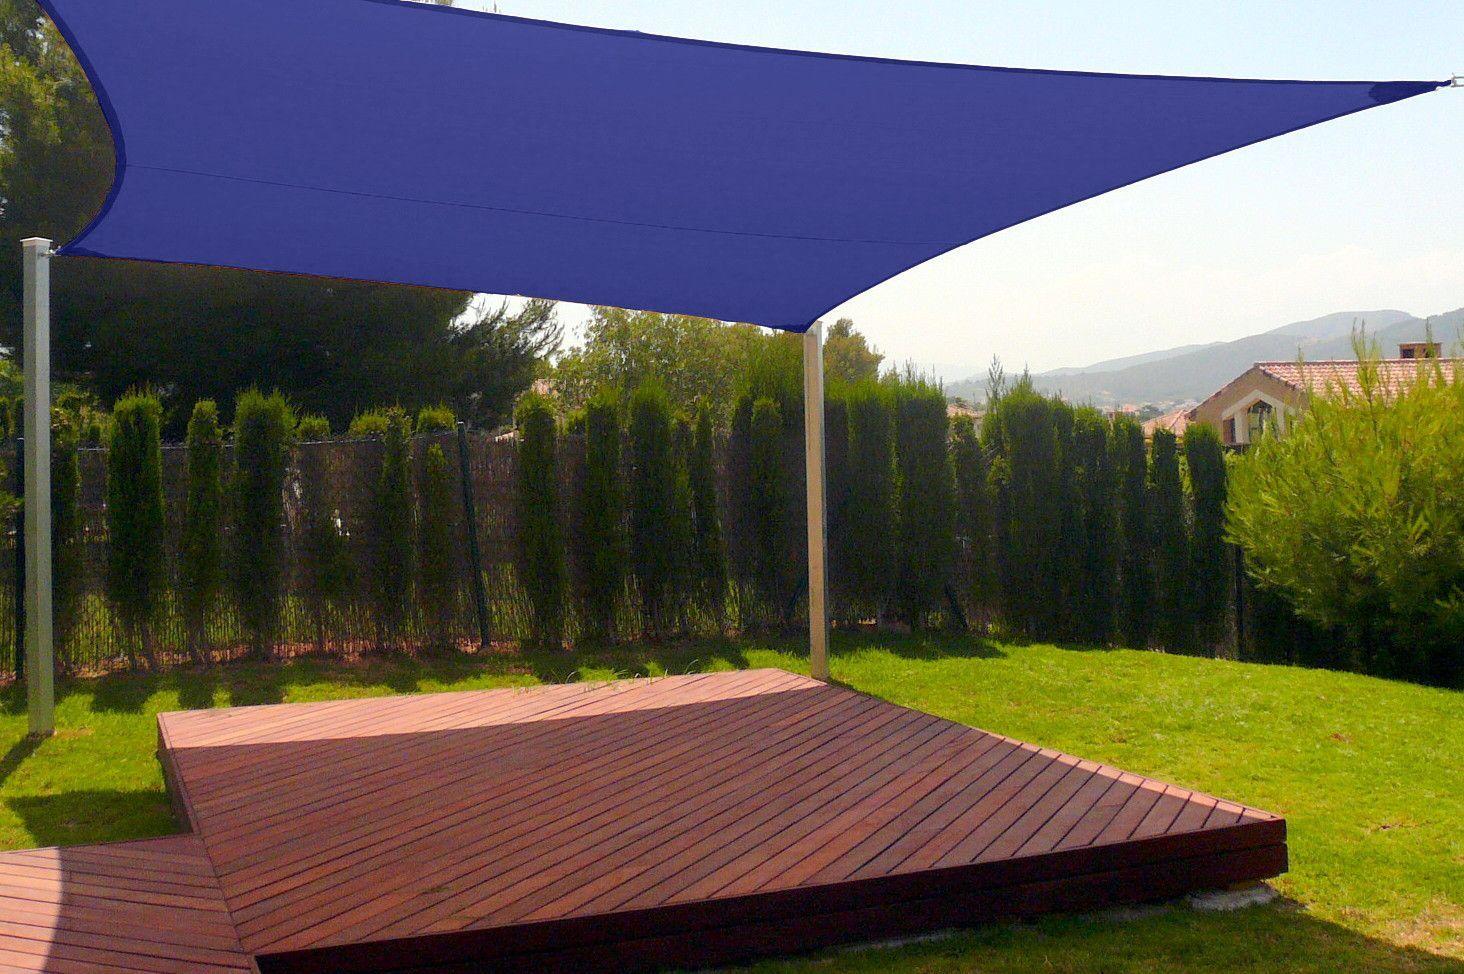 New Premium Clevr Sun Shade Canopy Sail 18' Square UV ...